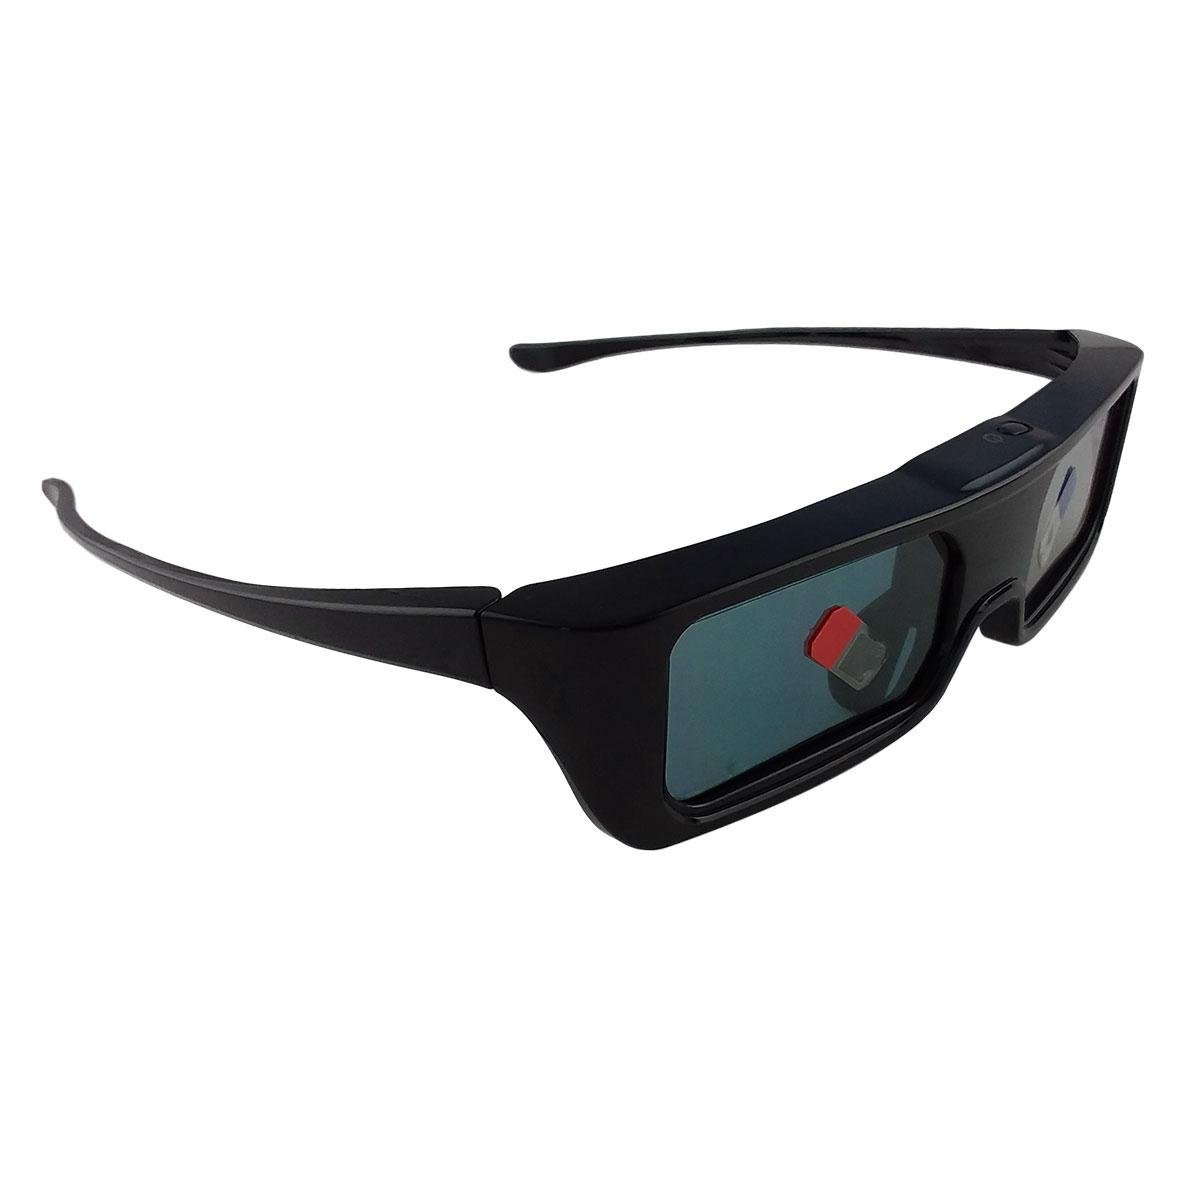 Panasonic TY-ER3D5MA Active 3D Glasses for 3-D Television TYER3D5MA TV Lenses